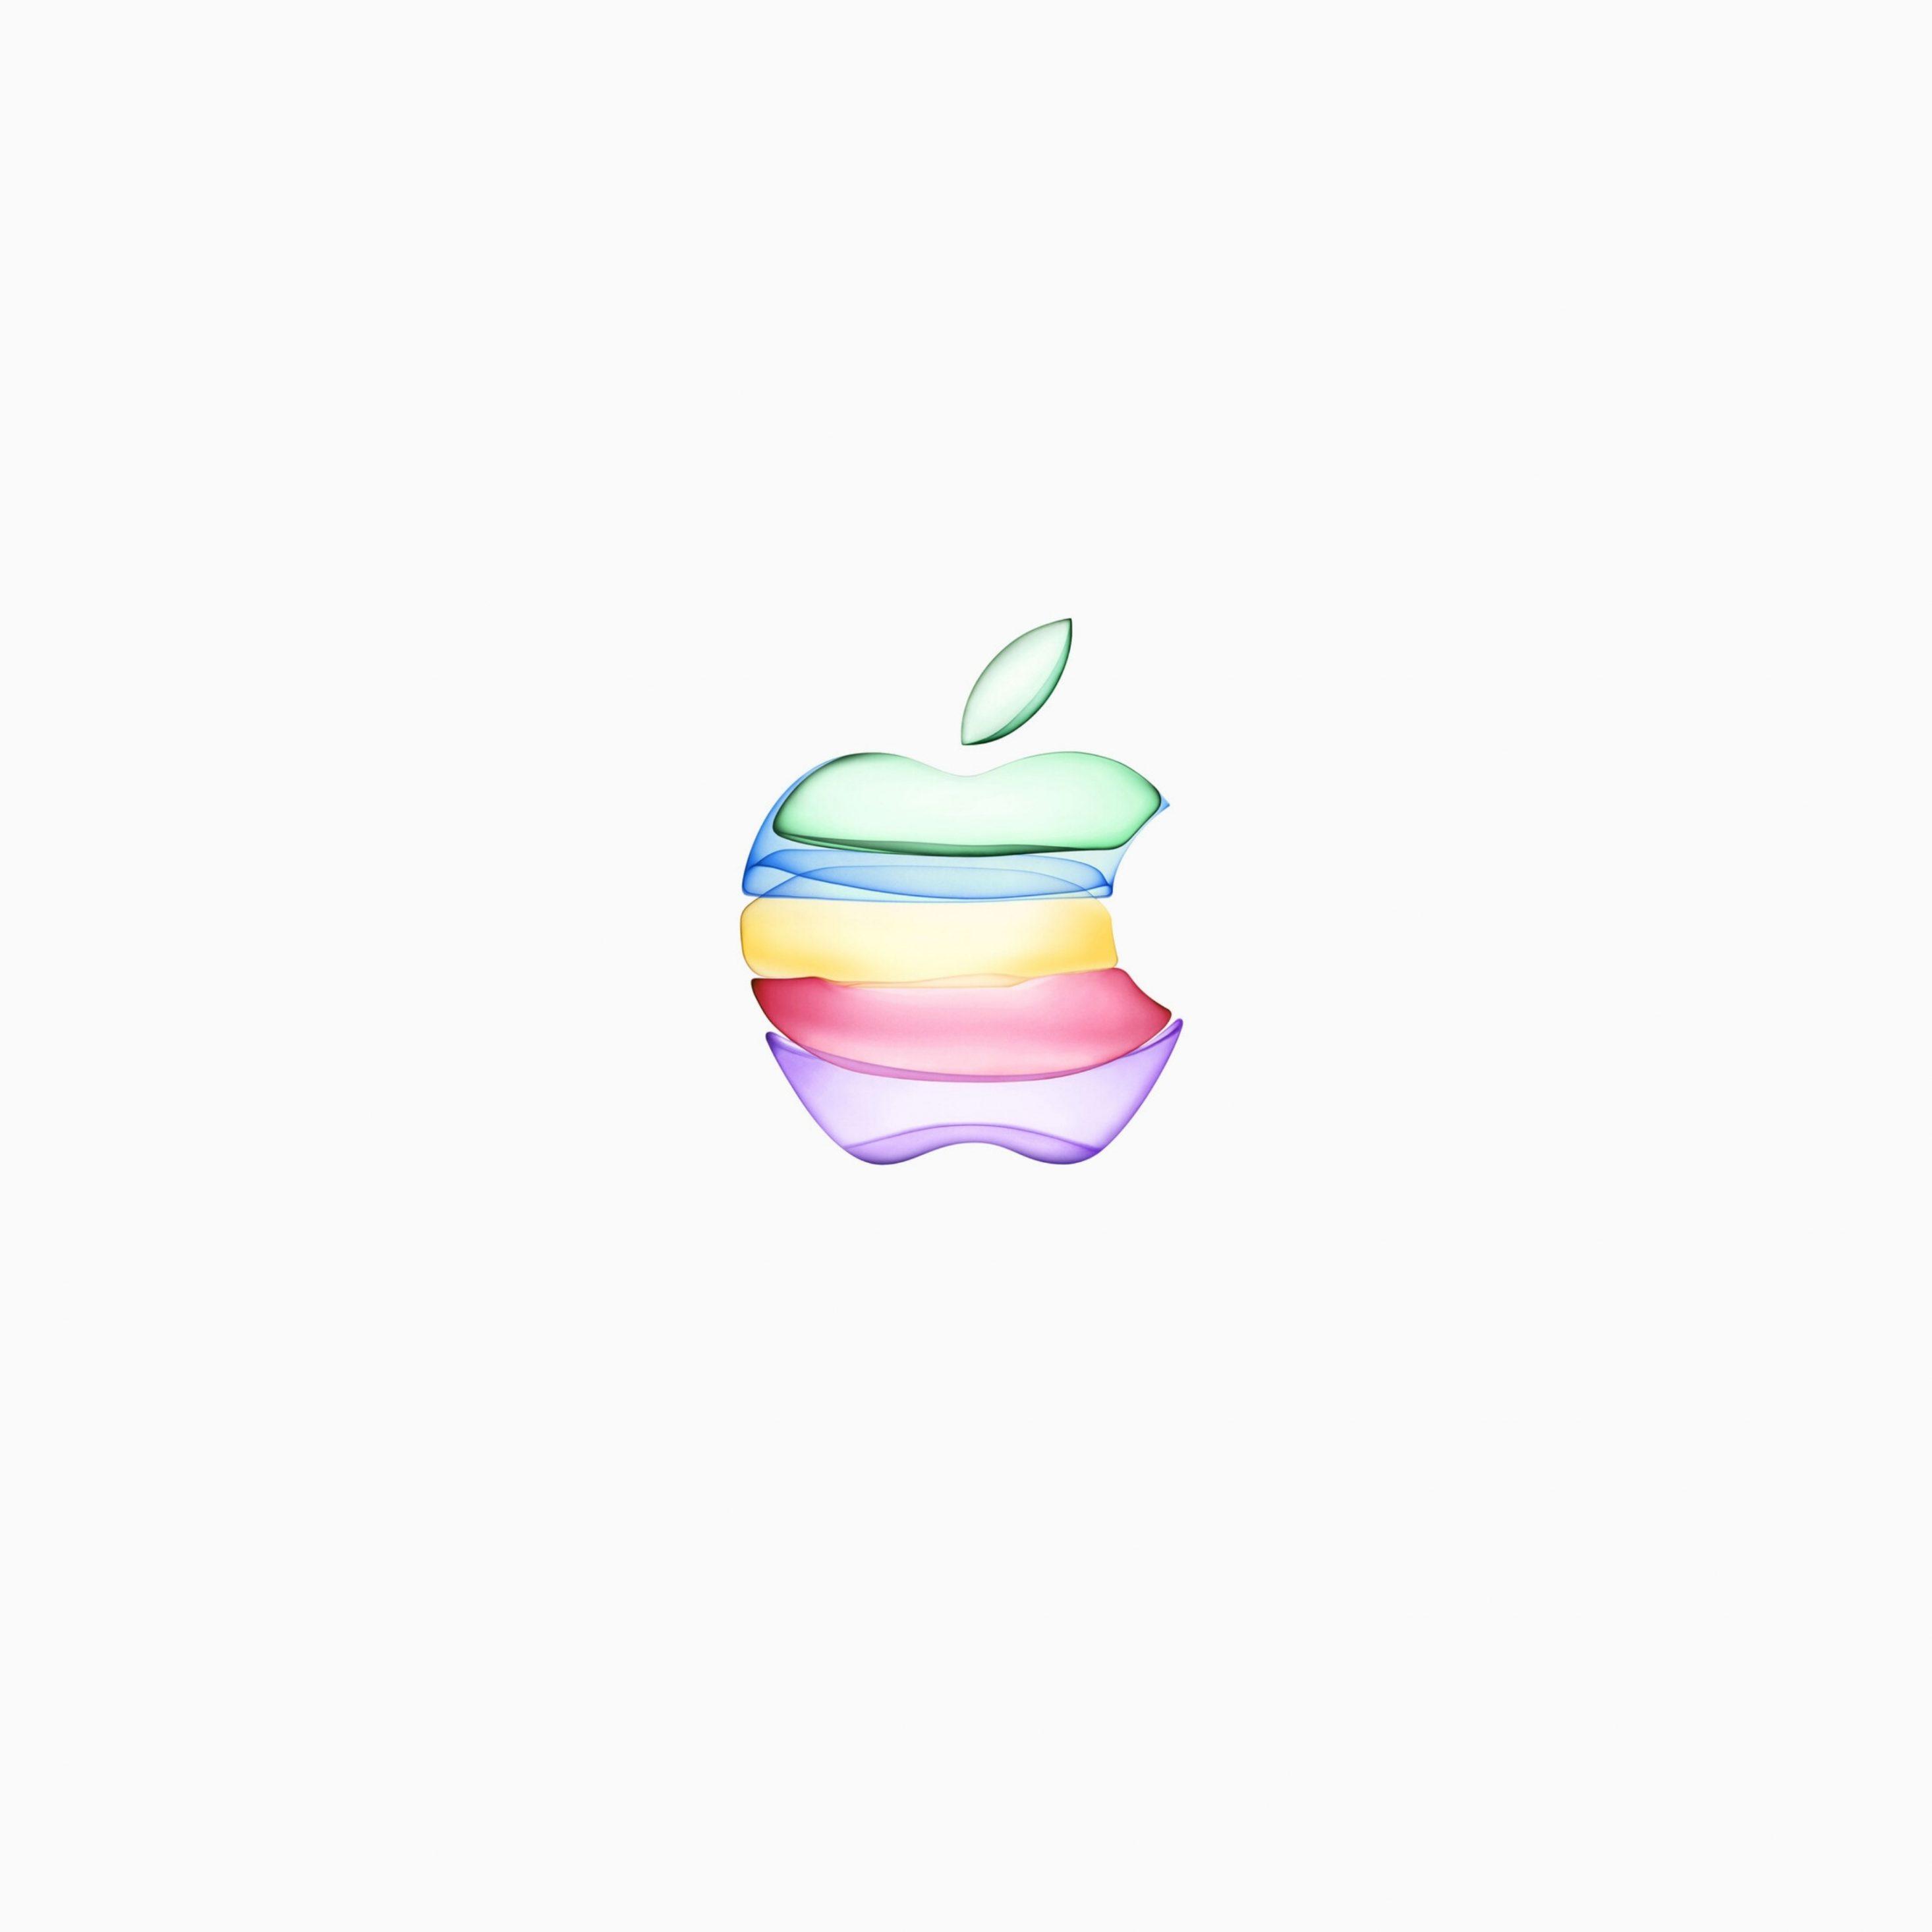 2932x2932 iPad Pro wallpaper 4k iPhone 11 Apple Logo White Background iPad Wallpaper 2932x2932 pixels resolution